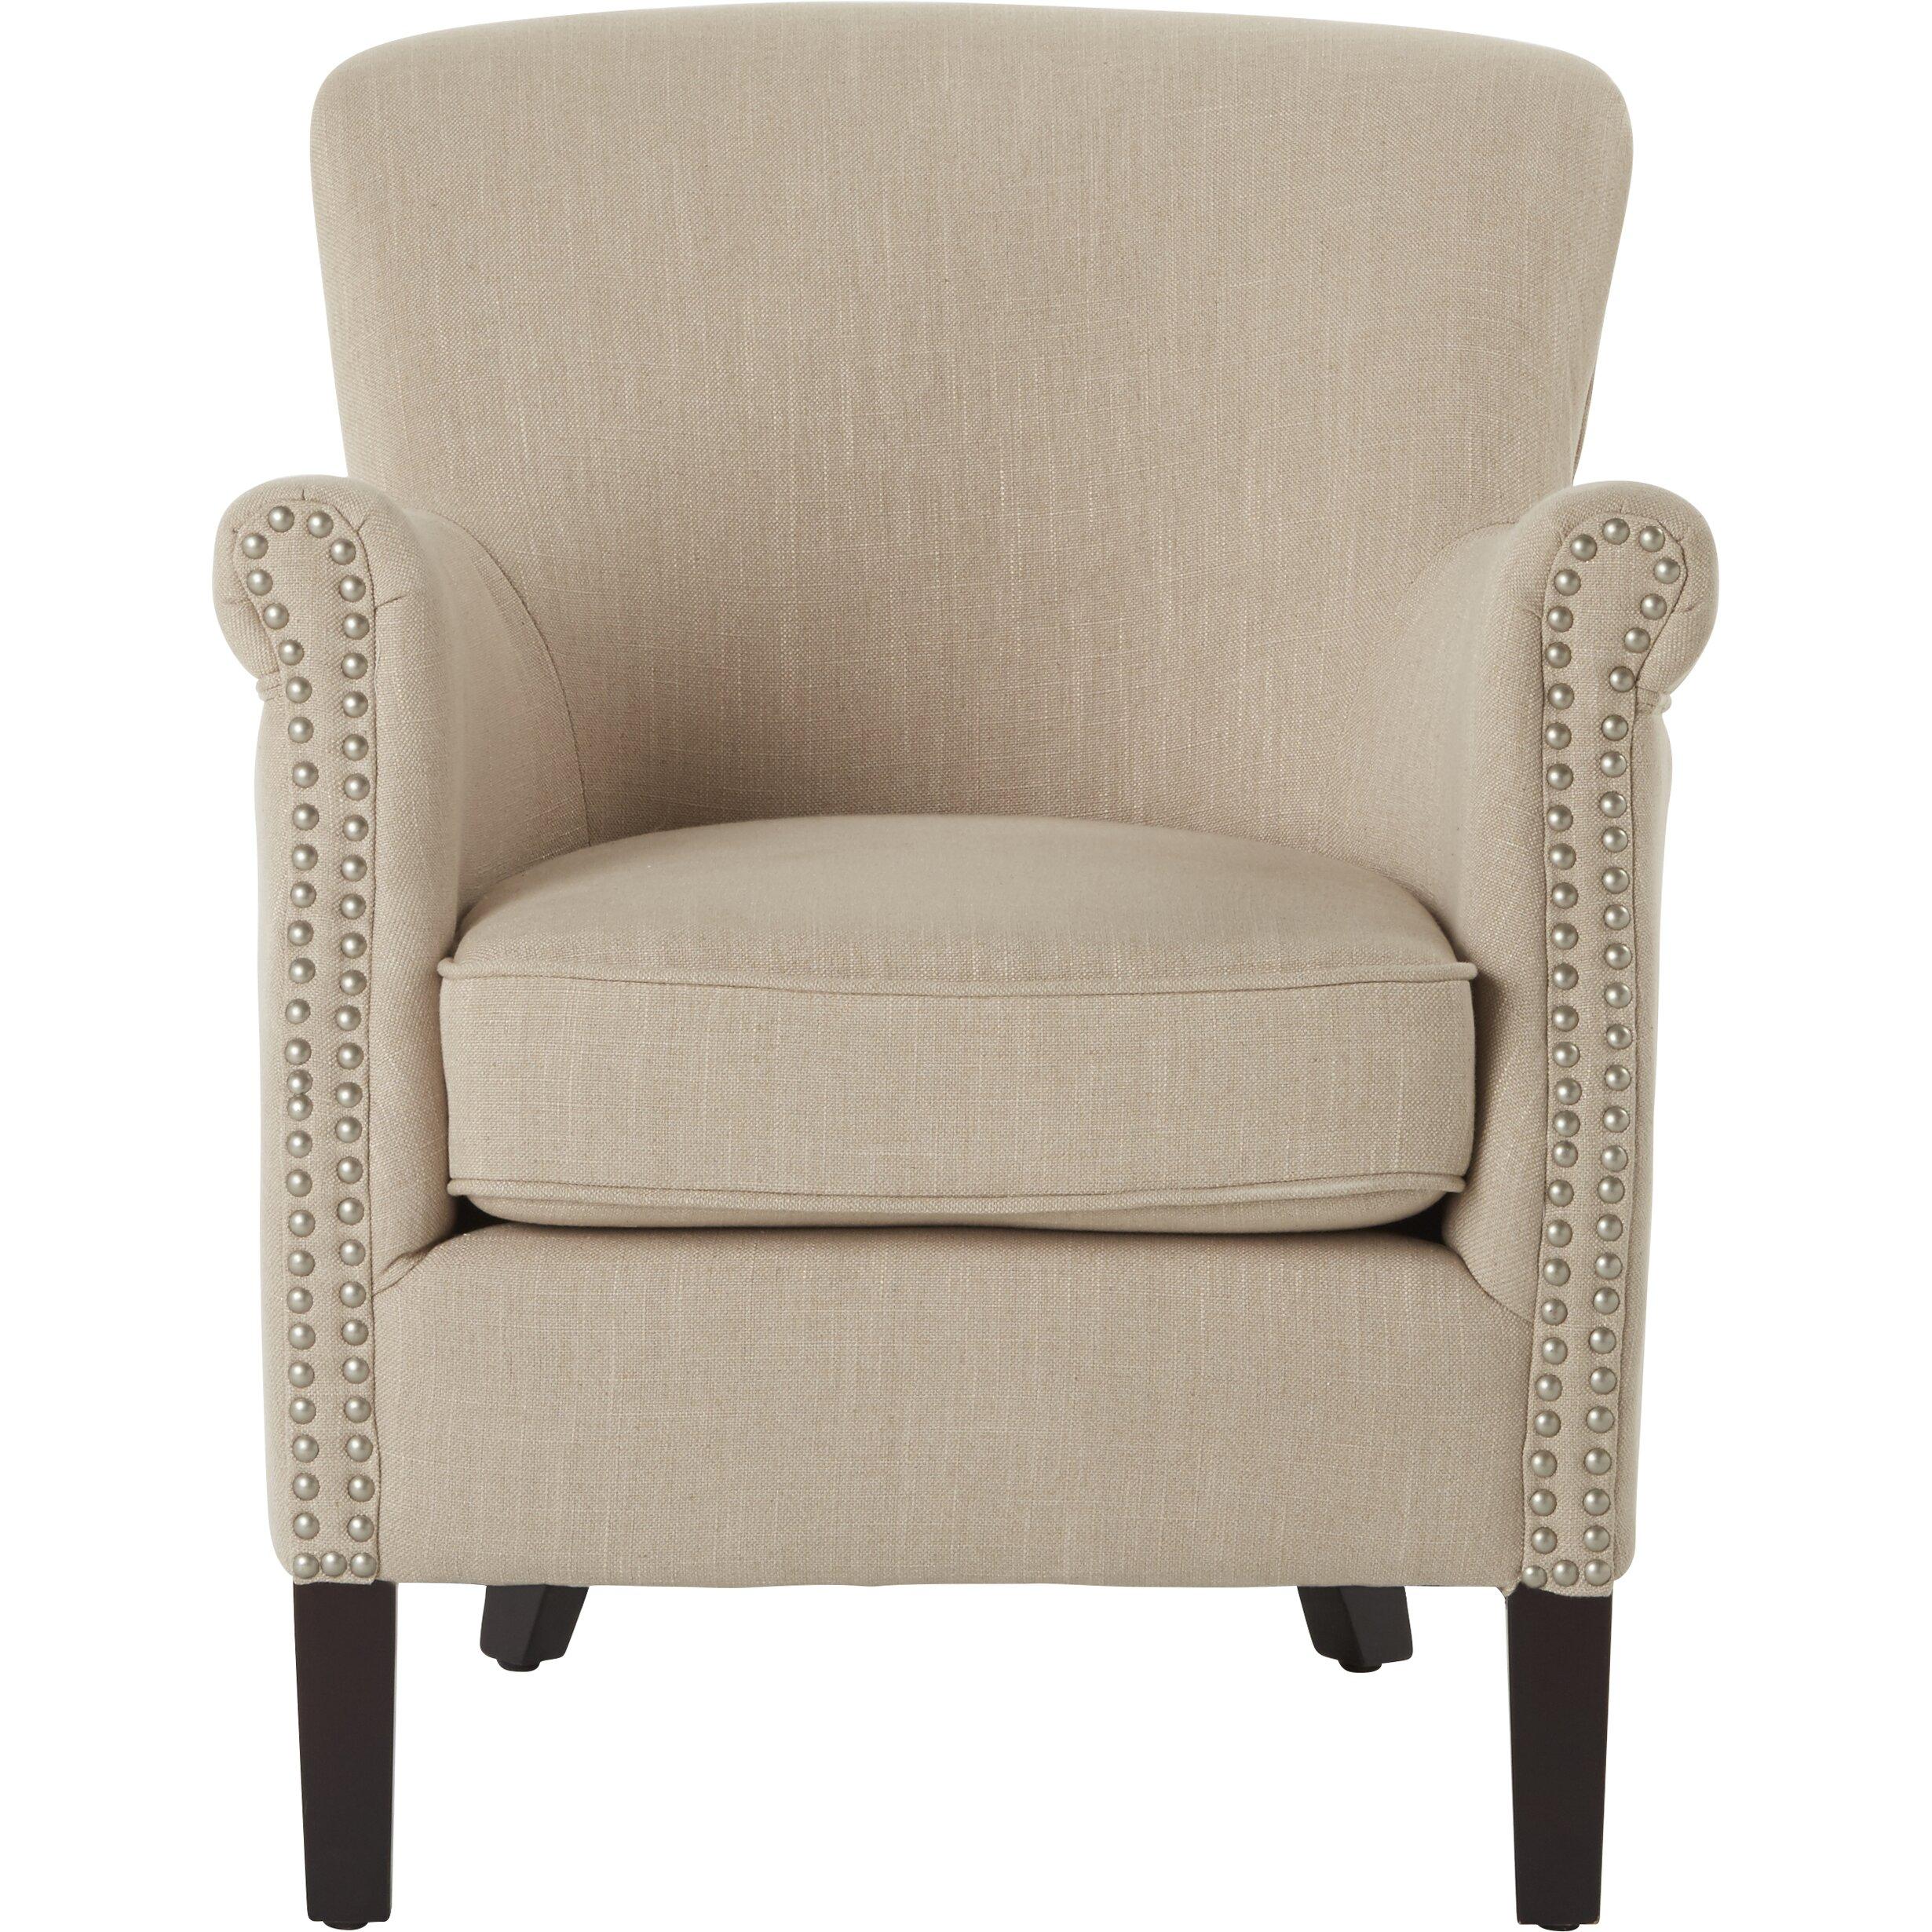 fairmont park keynsham armchair reviews wayfair uk. Black Bedroom Furniture Sets. Home Design Ideas